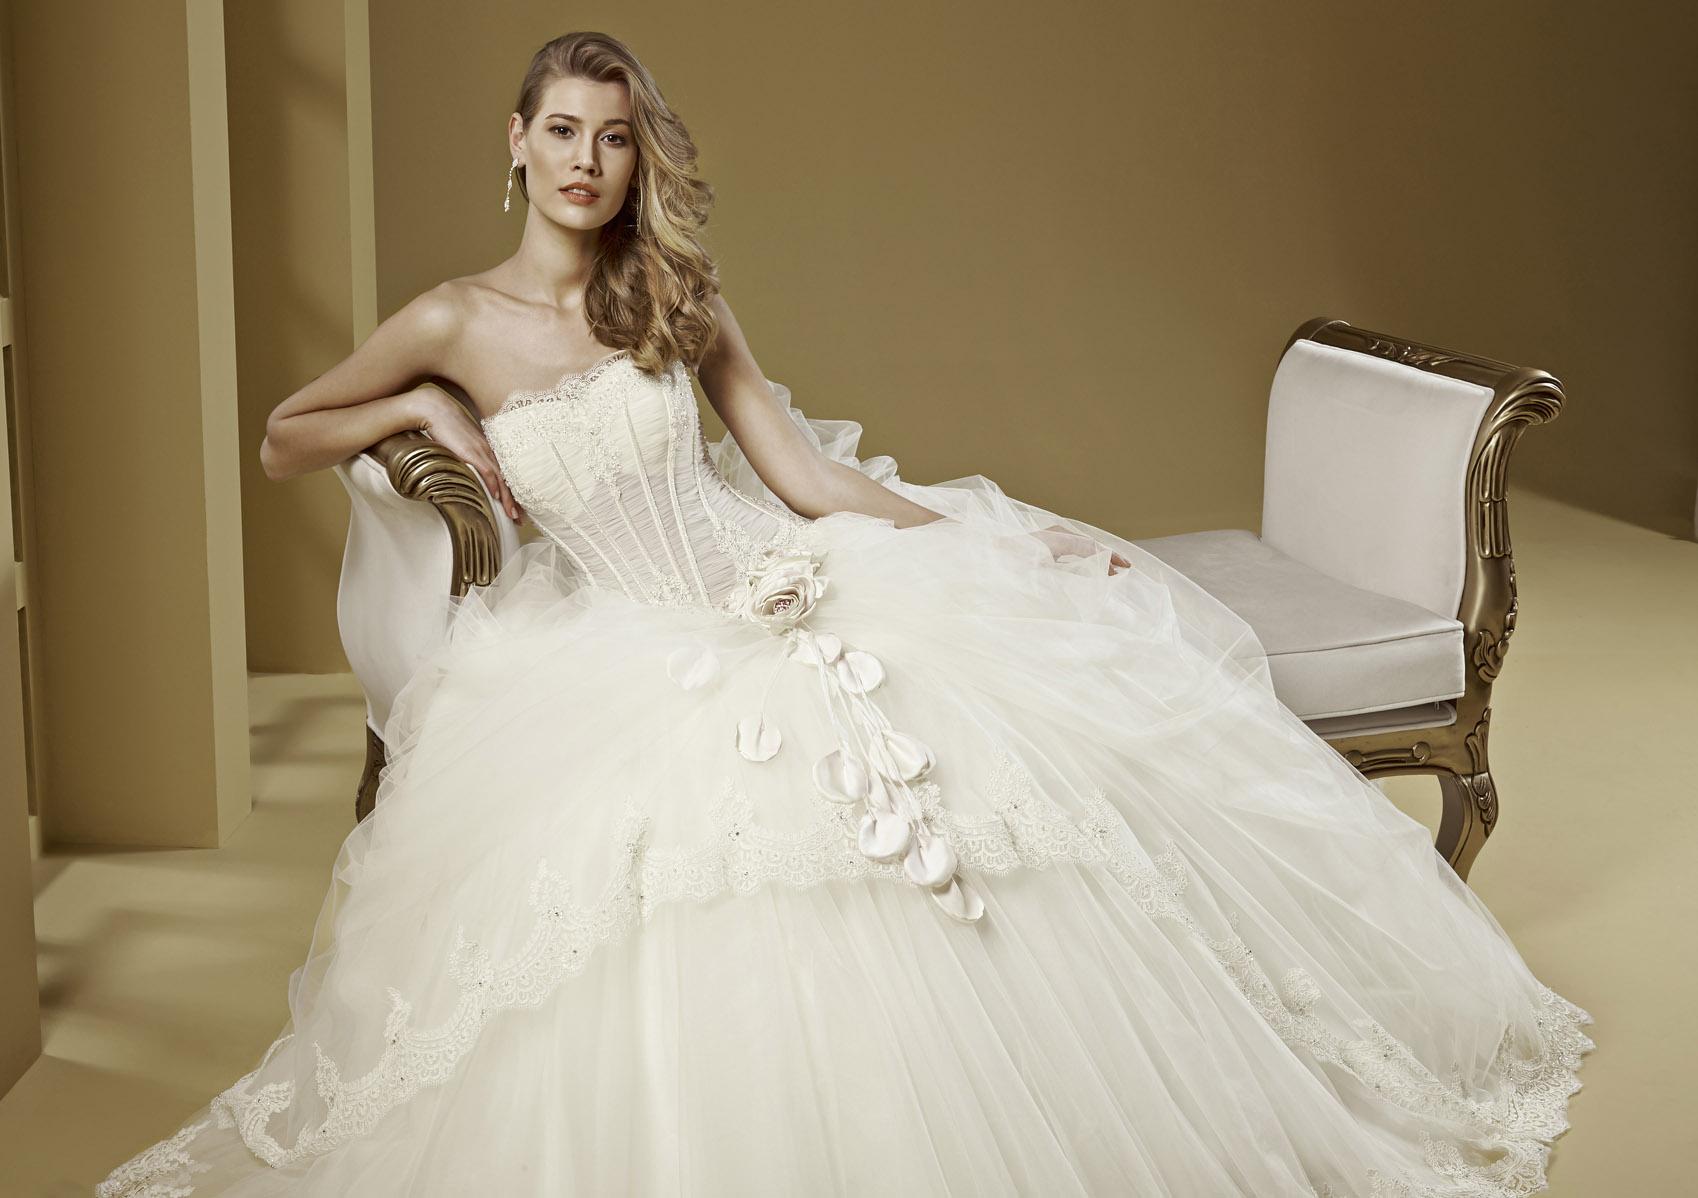 a75eeba986b0 Romance Bridal Collection 2015 - Nicole Fashion Group